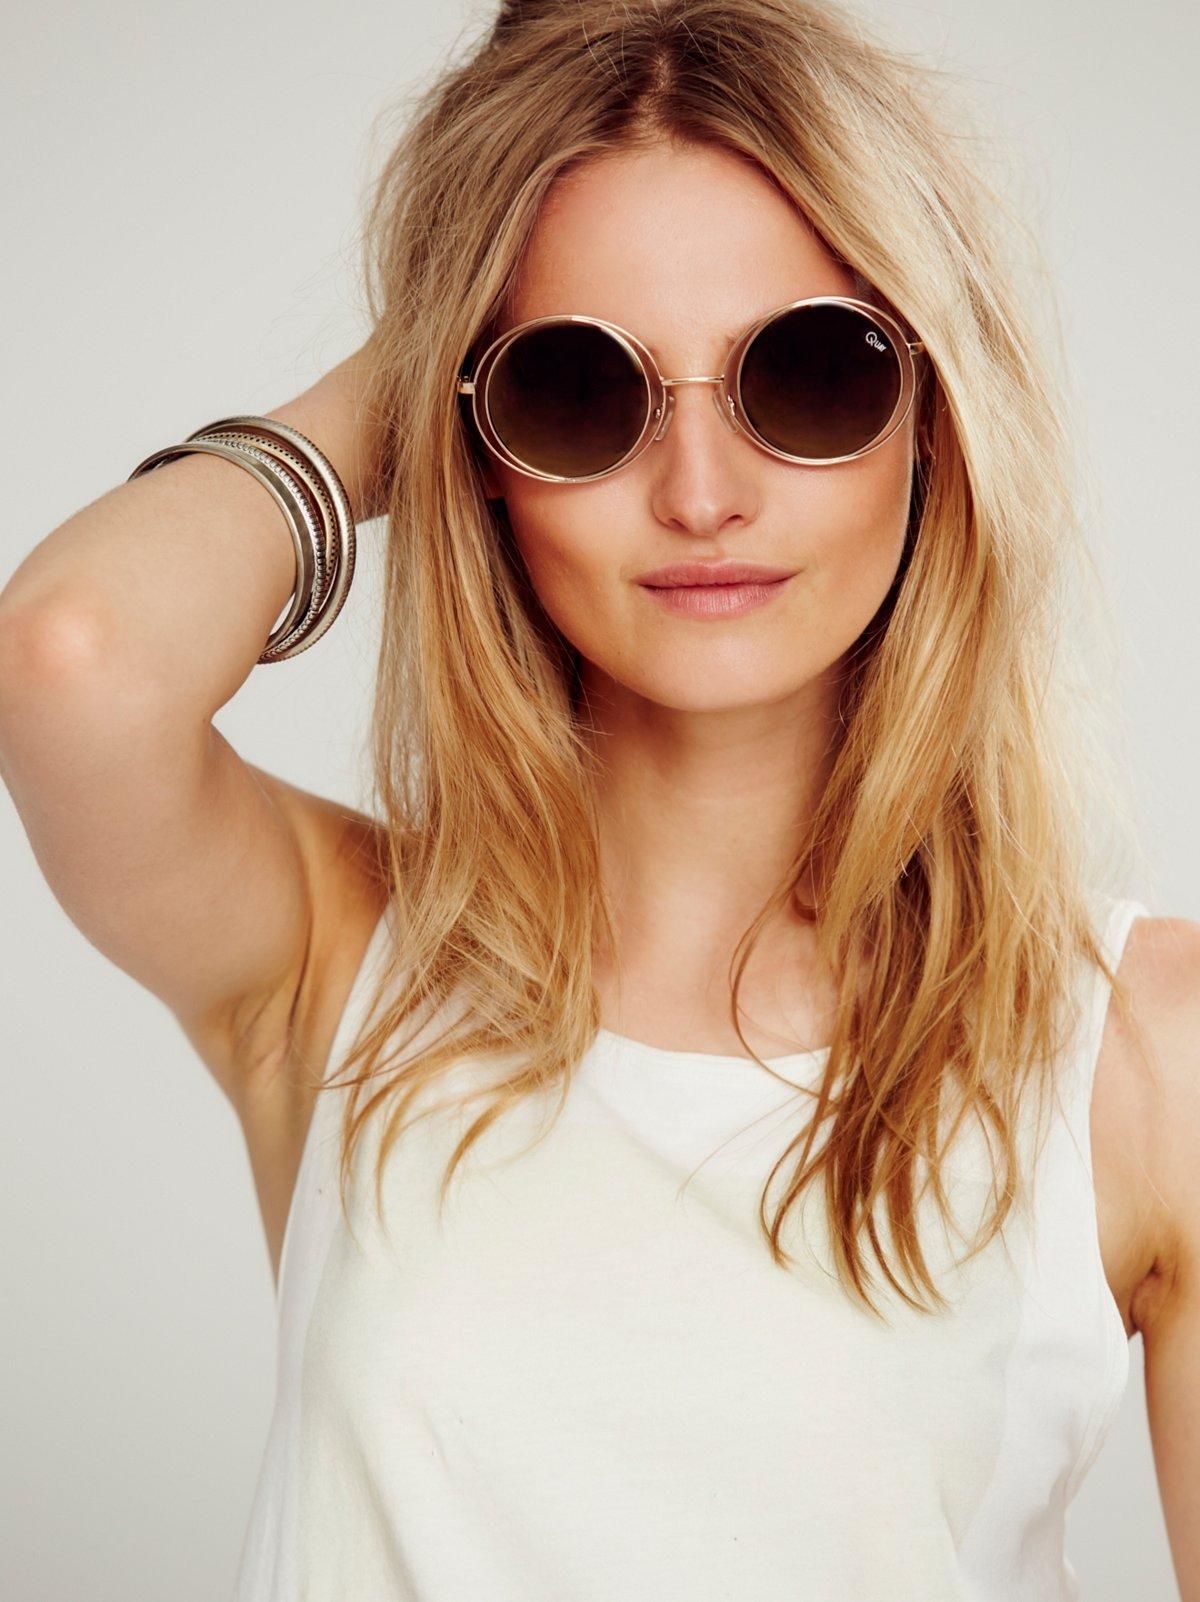 Cherish Sunglass